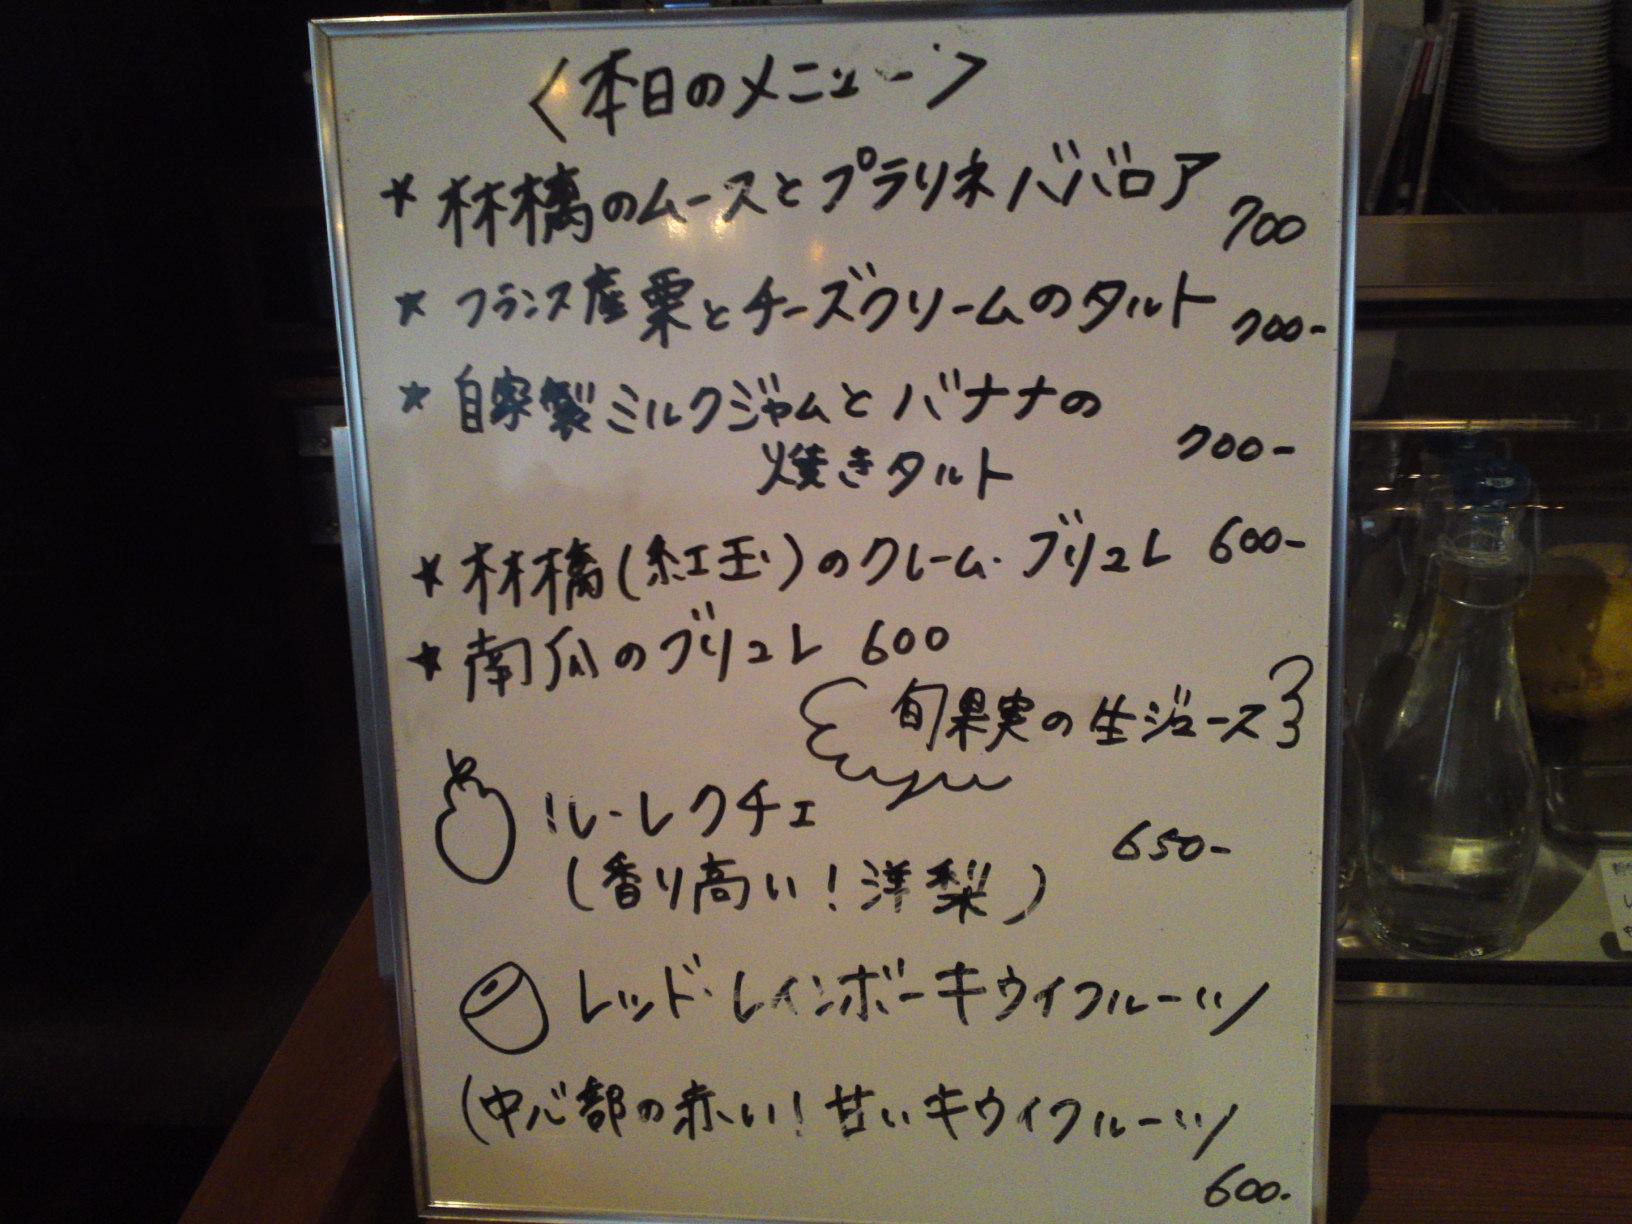 Today at Patina Cafe